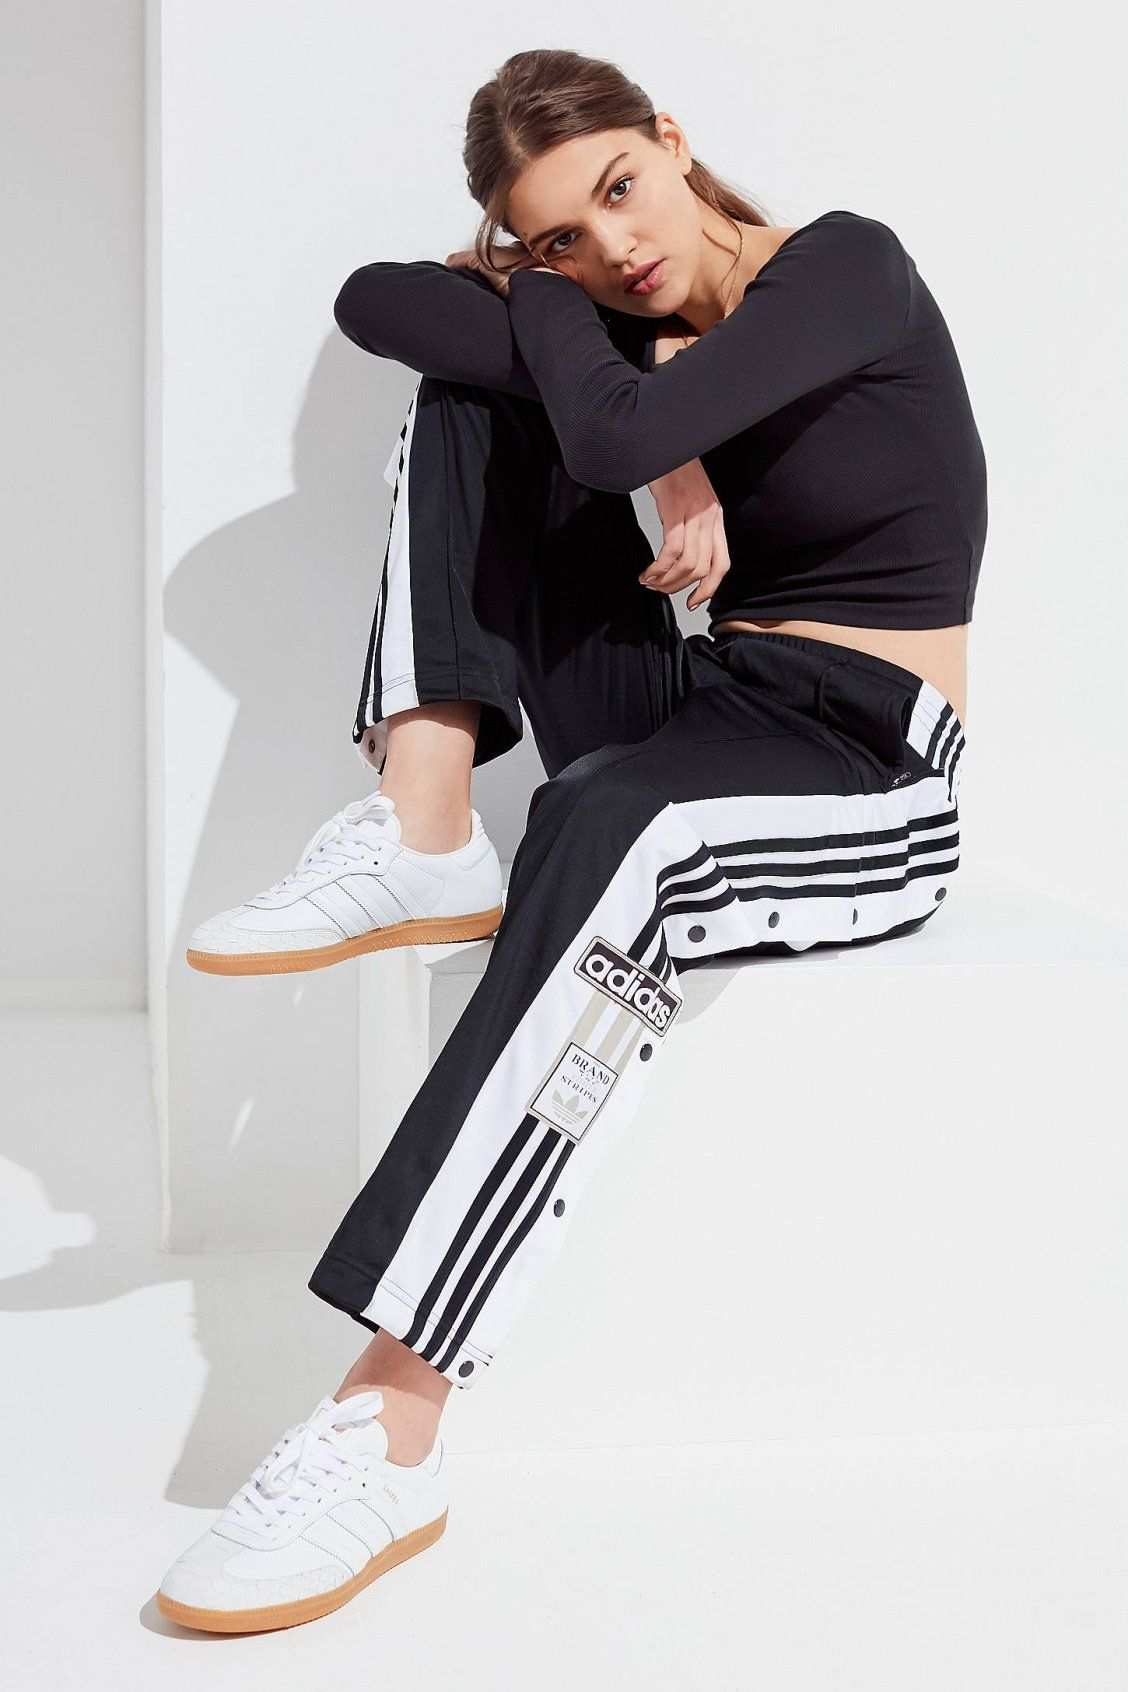 adidas Originals Womens Adibreak Track Pant | Black